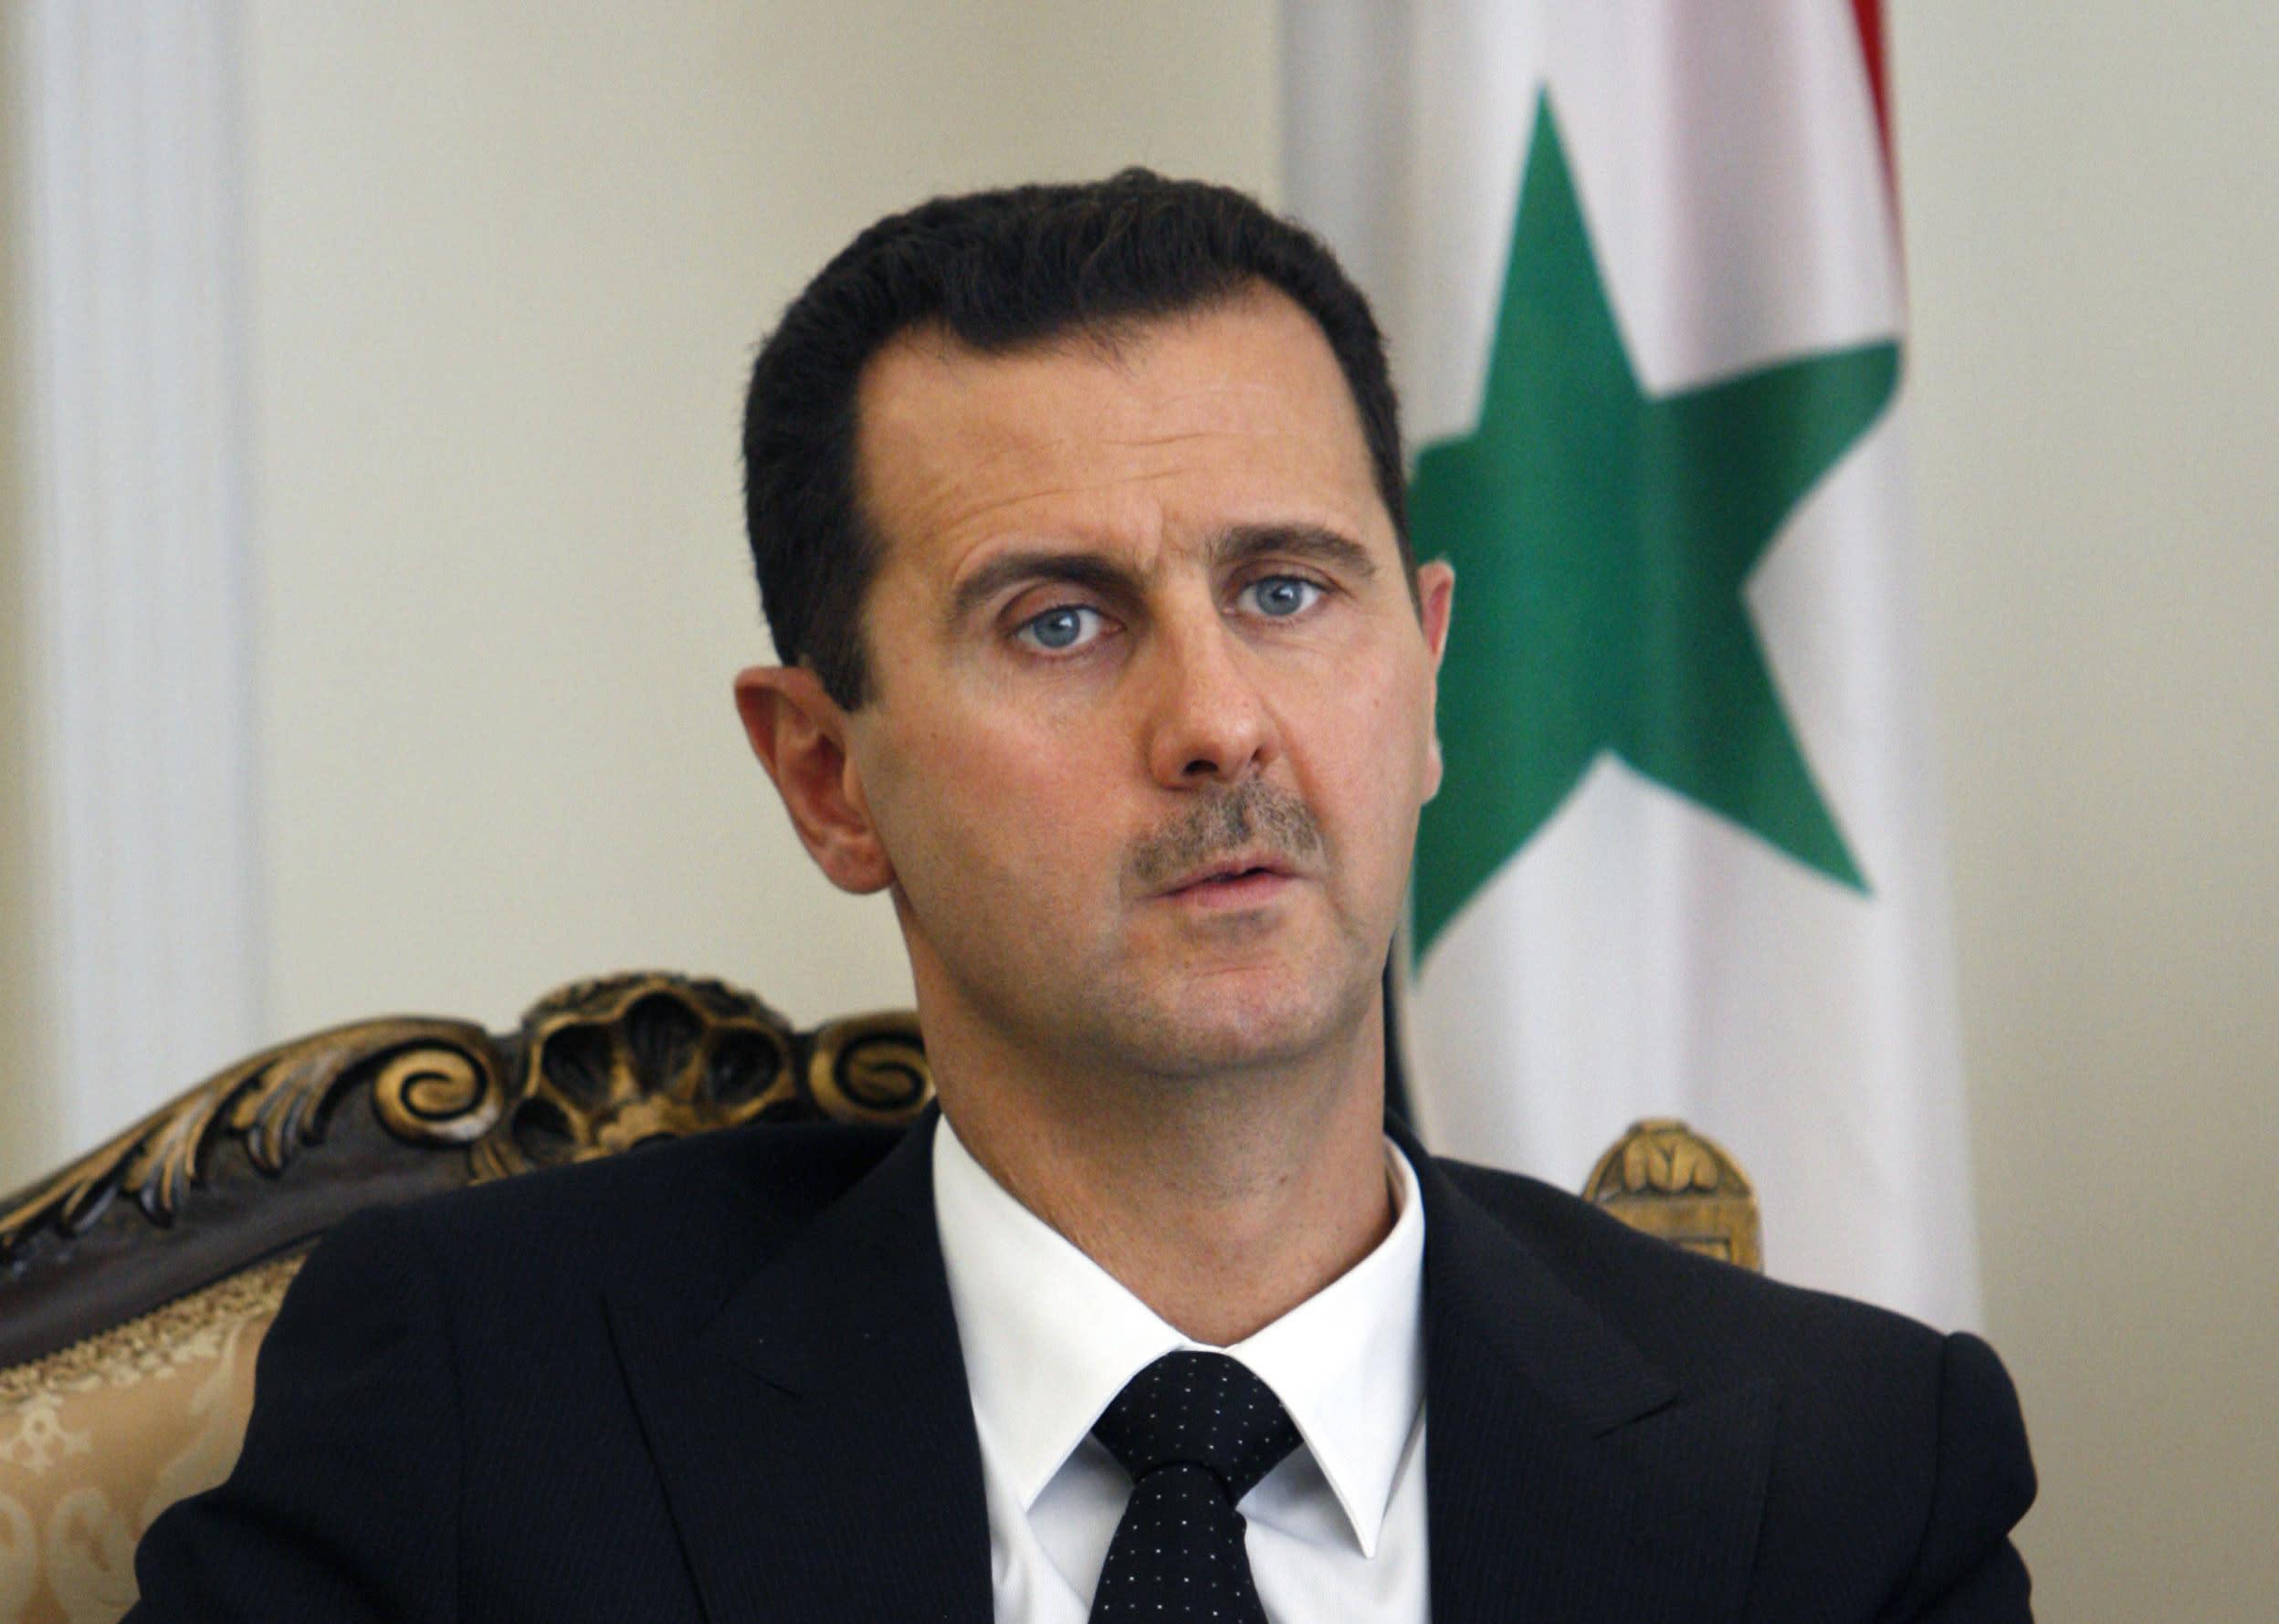 Syria president orders new tax breaks amid rising hardship